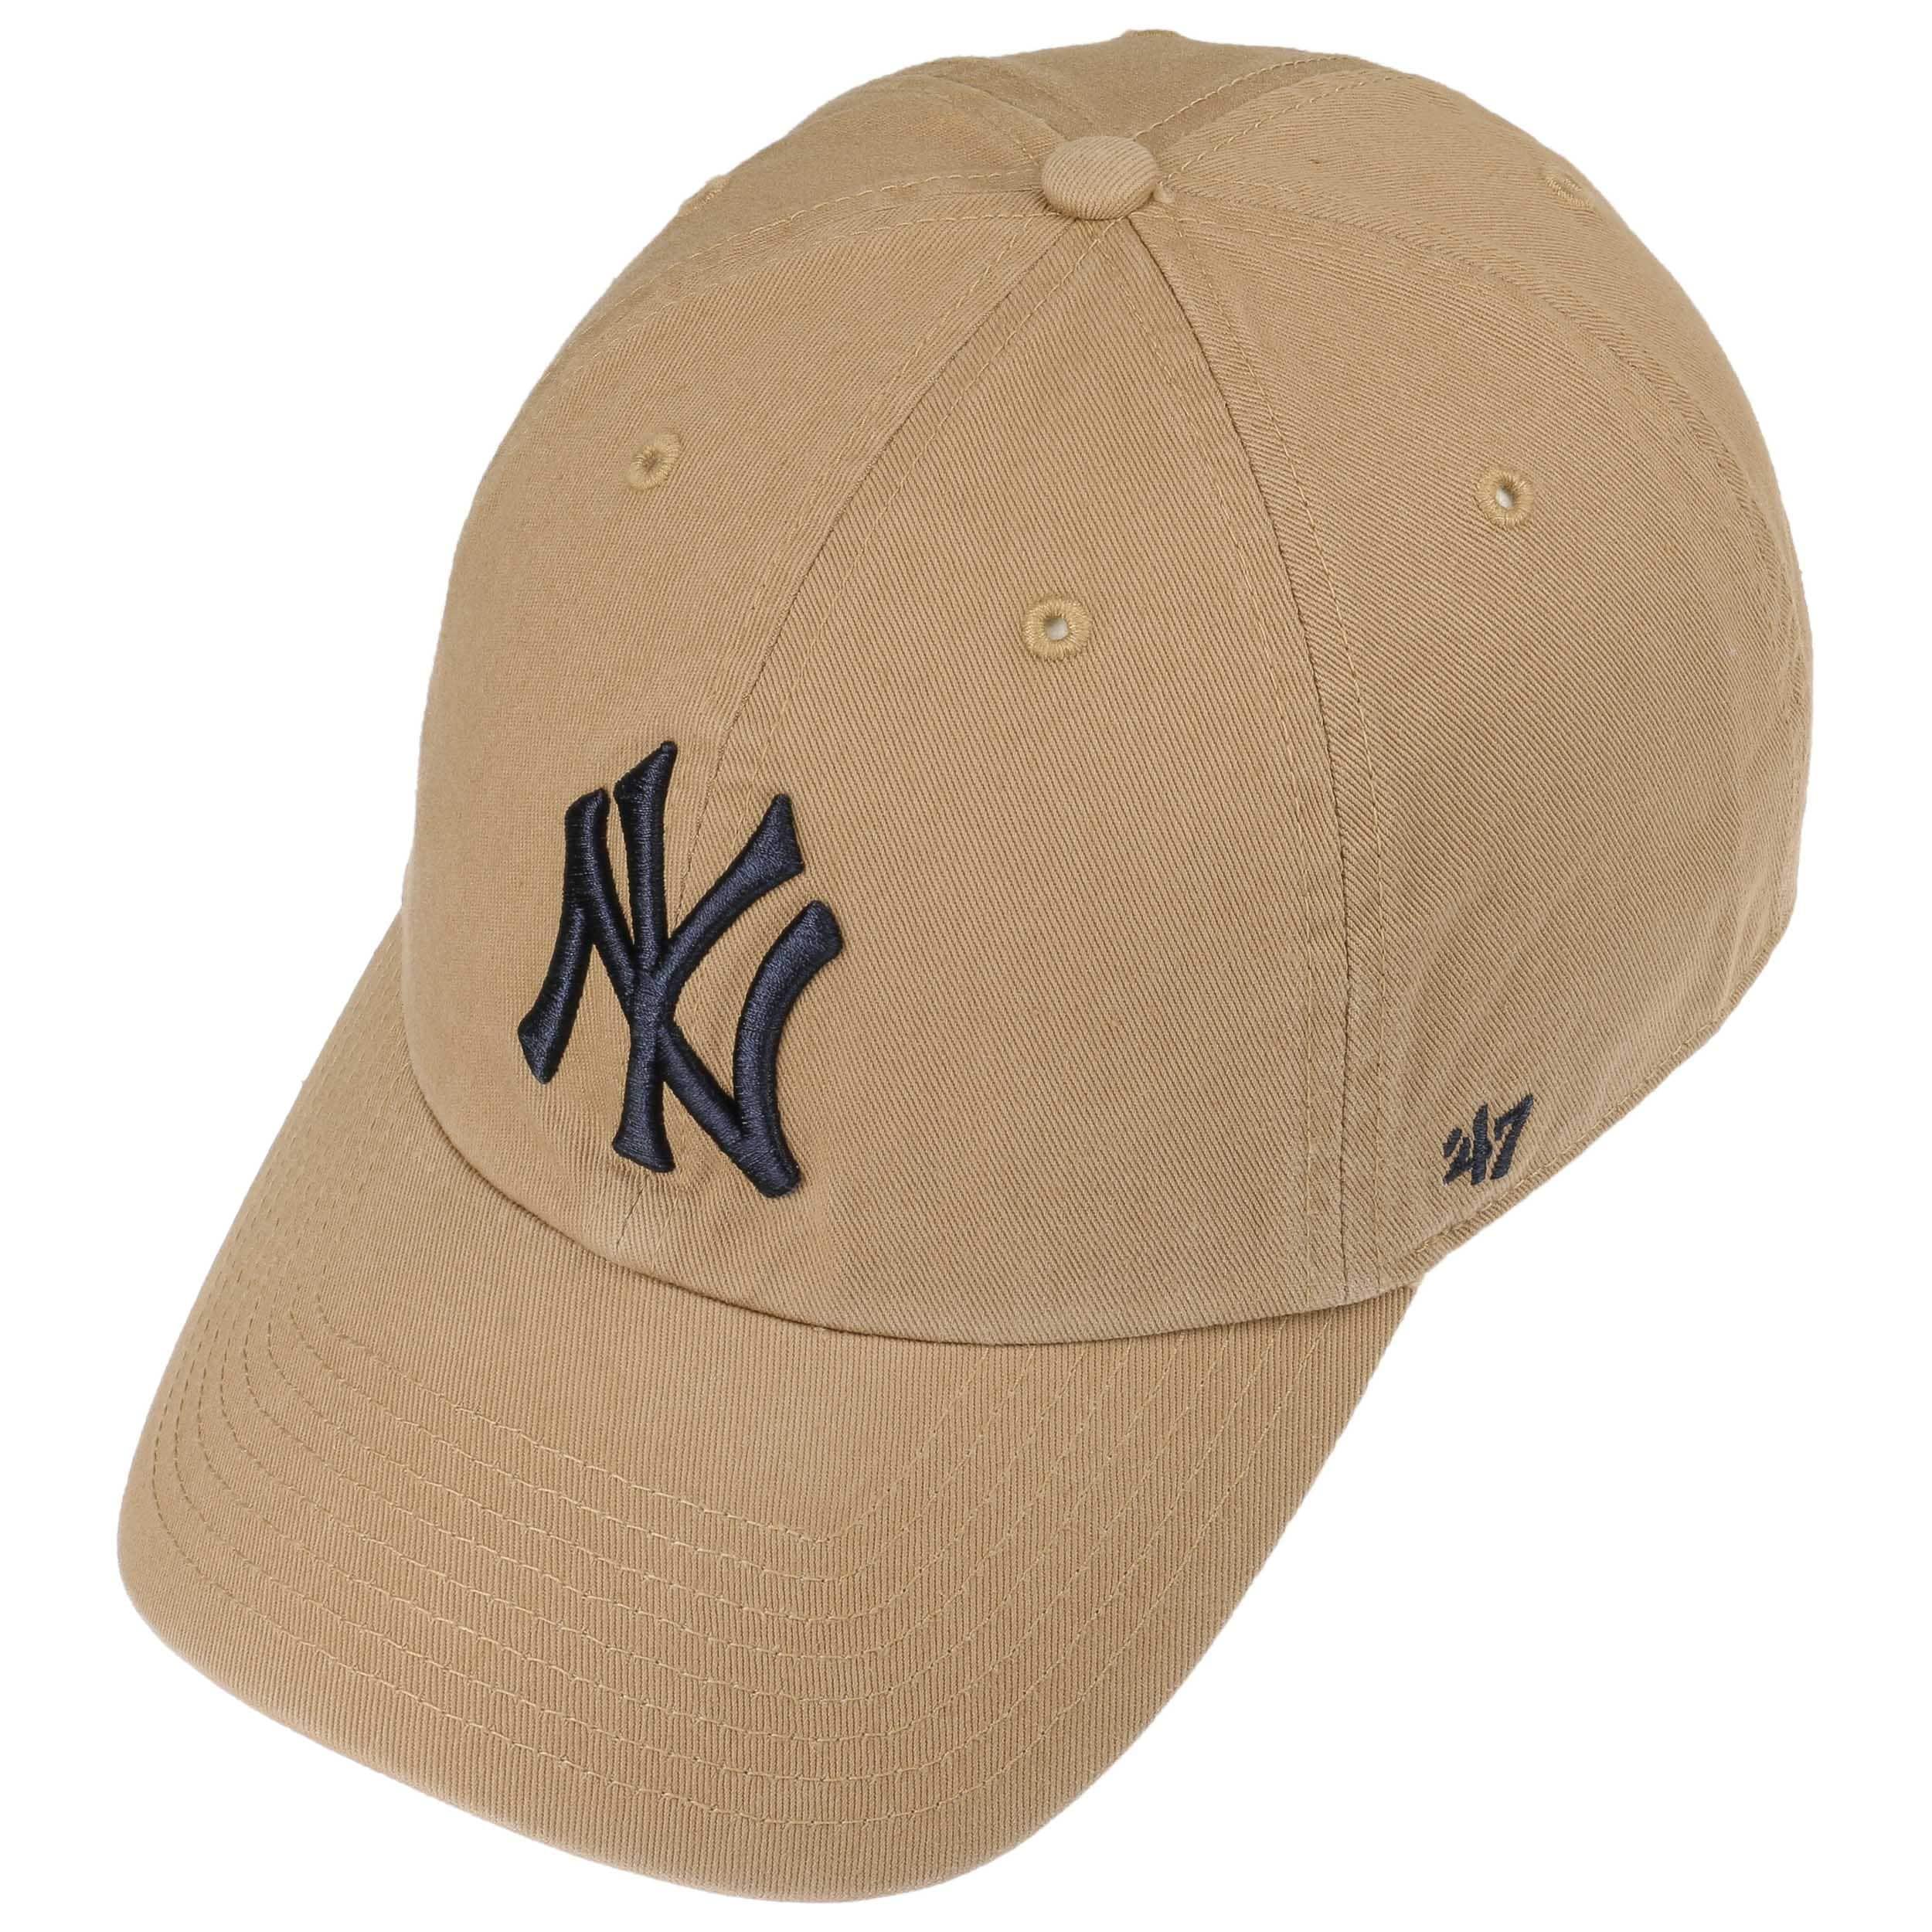 a3123af79670a ... Yankees CleanUp Strapback Cap by 47 Brand - beige 1 ...